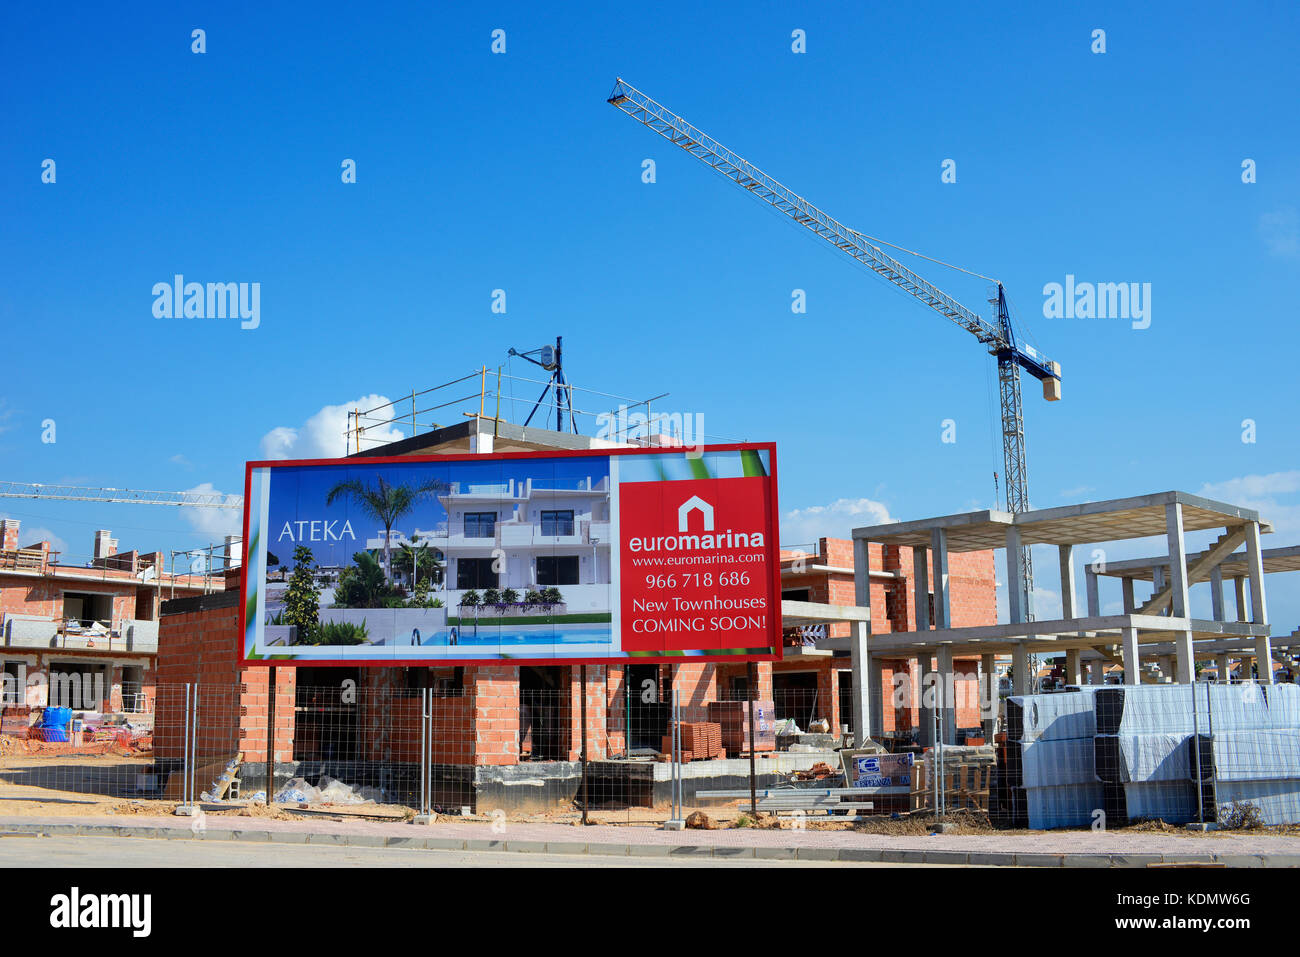 Euromarina property development construction building in progress in Dona Pepa, Ciudad Quesada, Rojales, Spain. - Stock Image